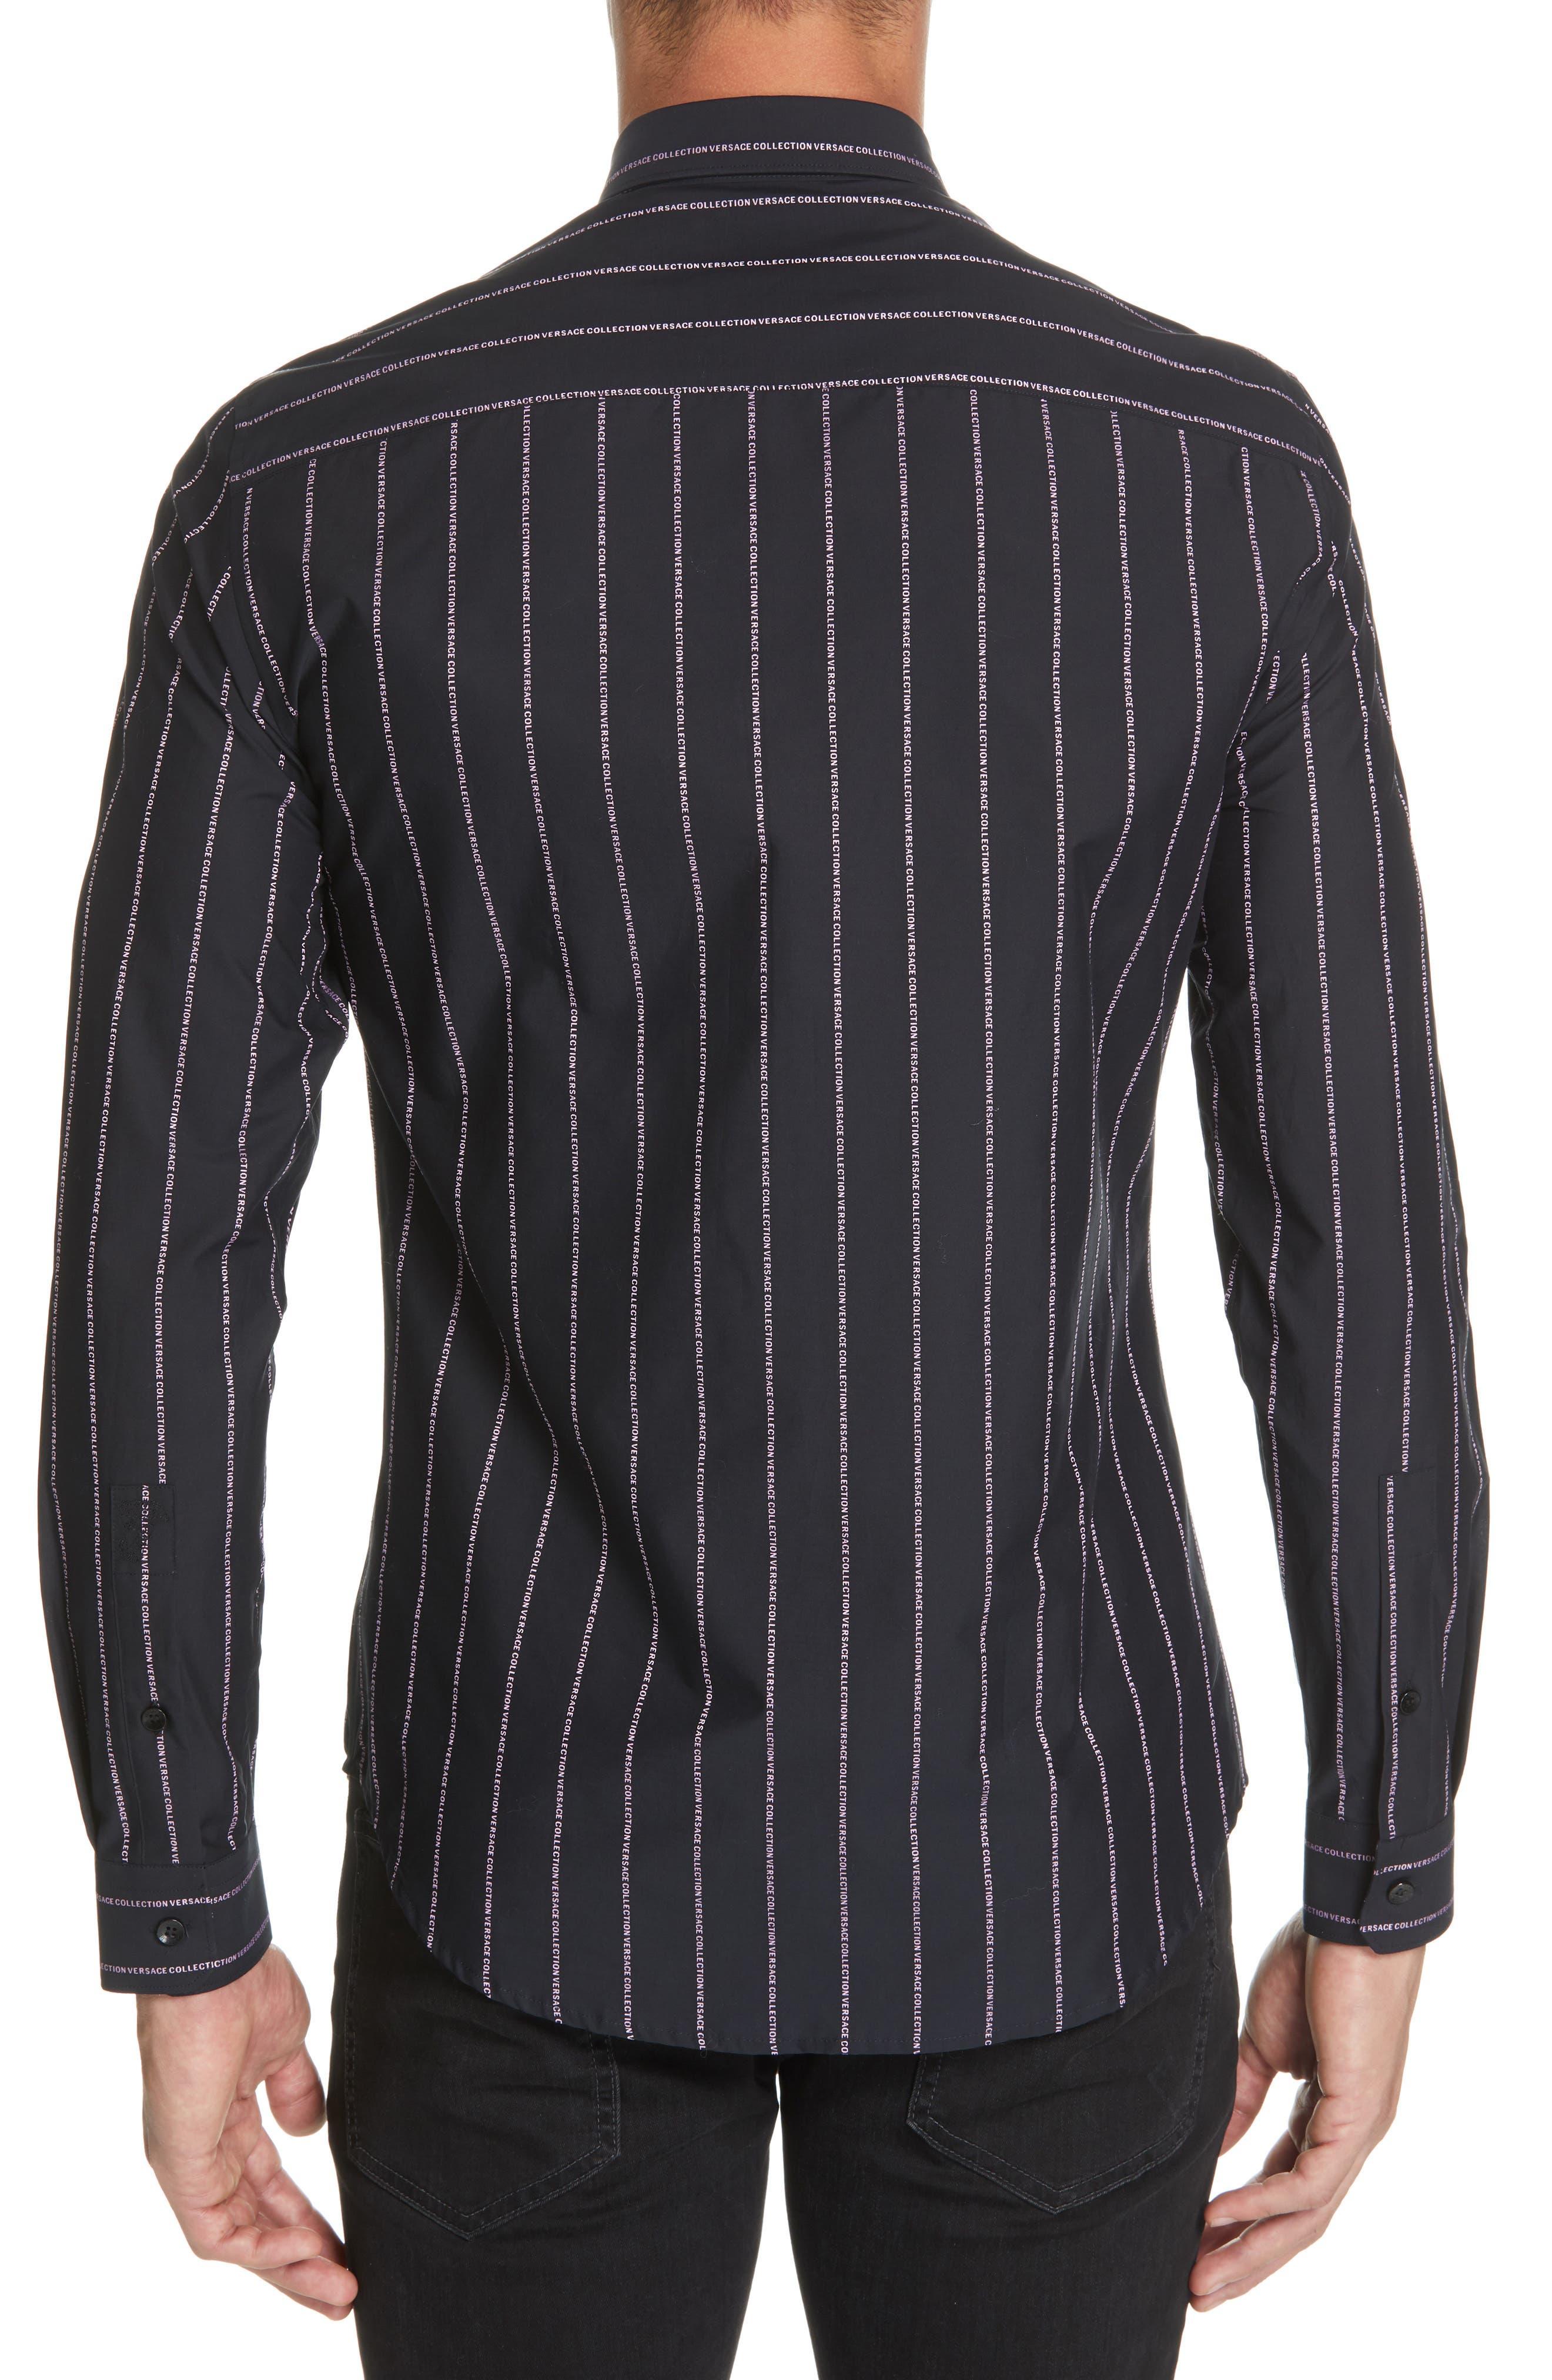 VERSACE COLLECTION, Logo Stripe Sport Shirt, Alternate thumbnail 3, color, BLACK/ PINK